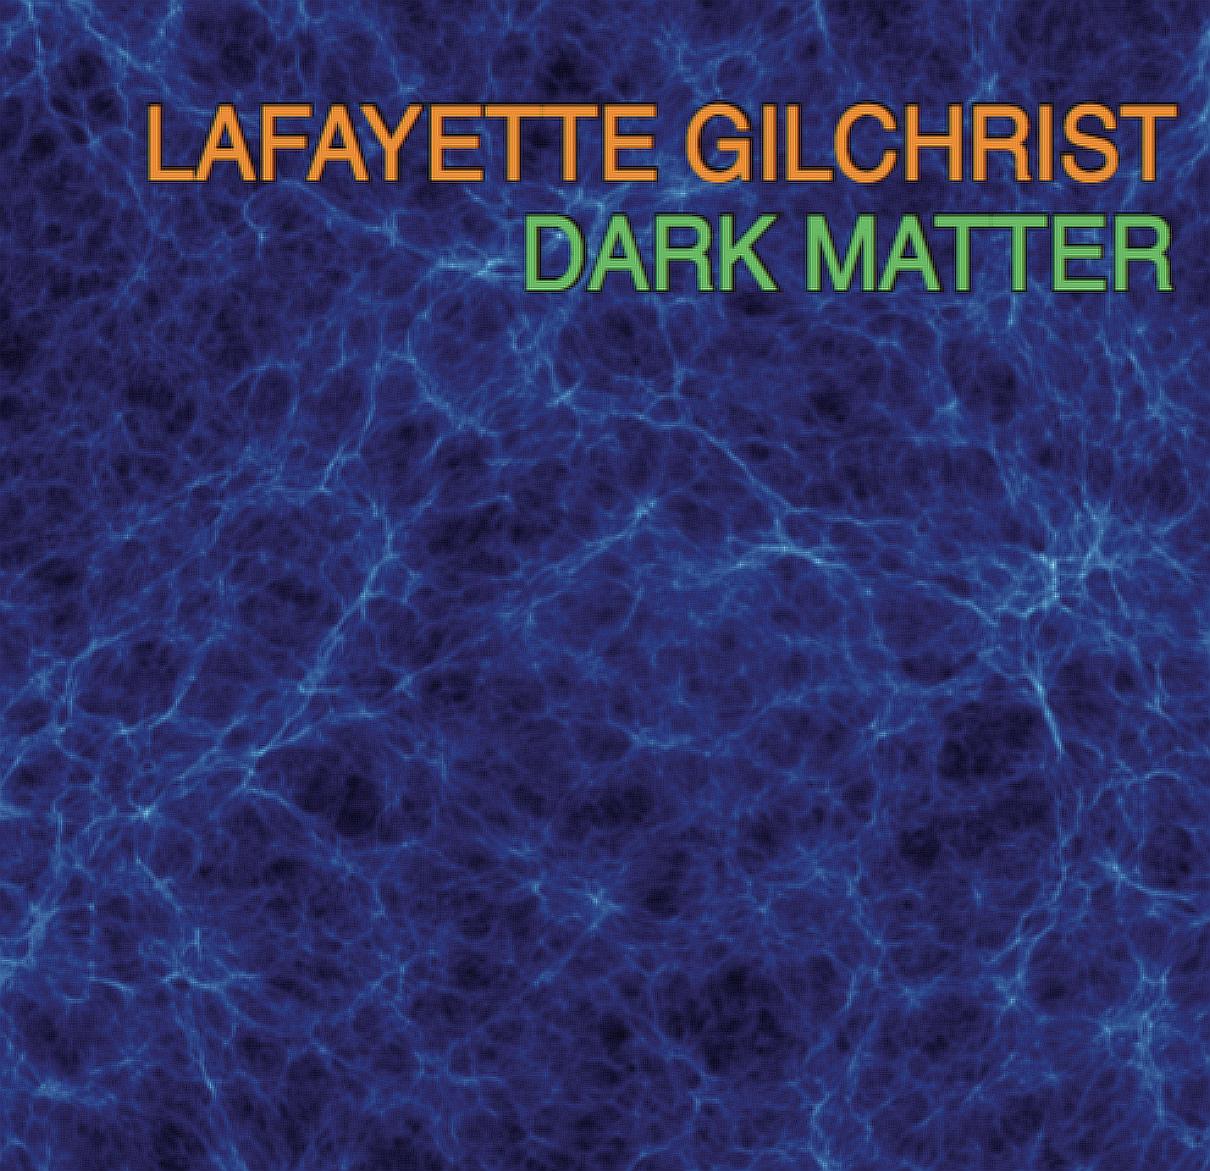 Gilchrist_Dark_Matter_Cover